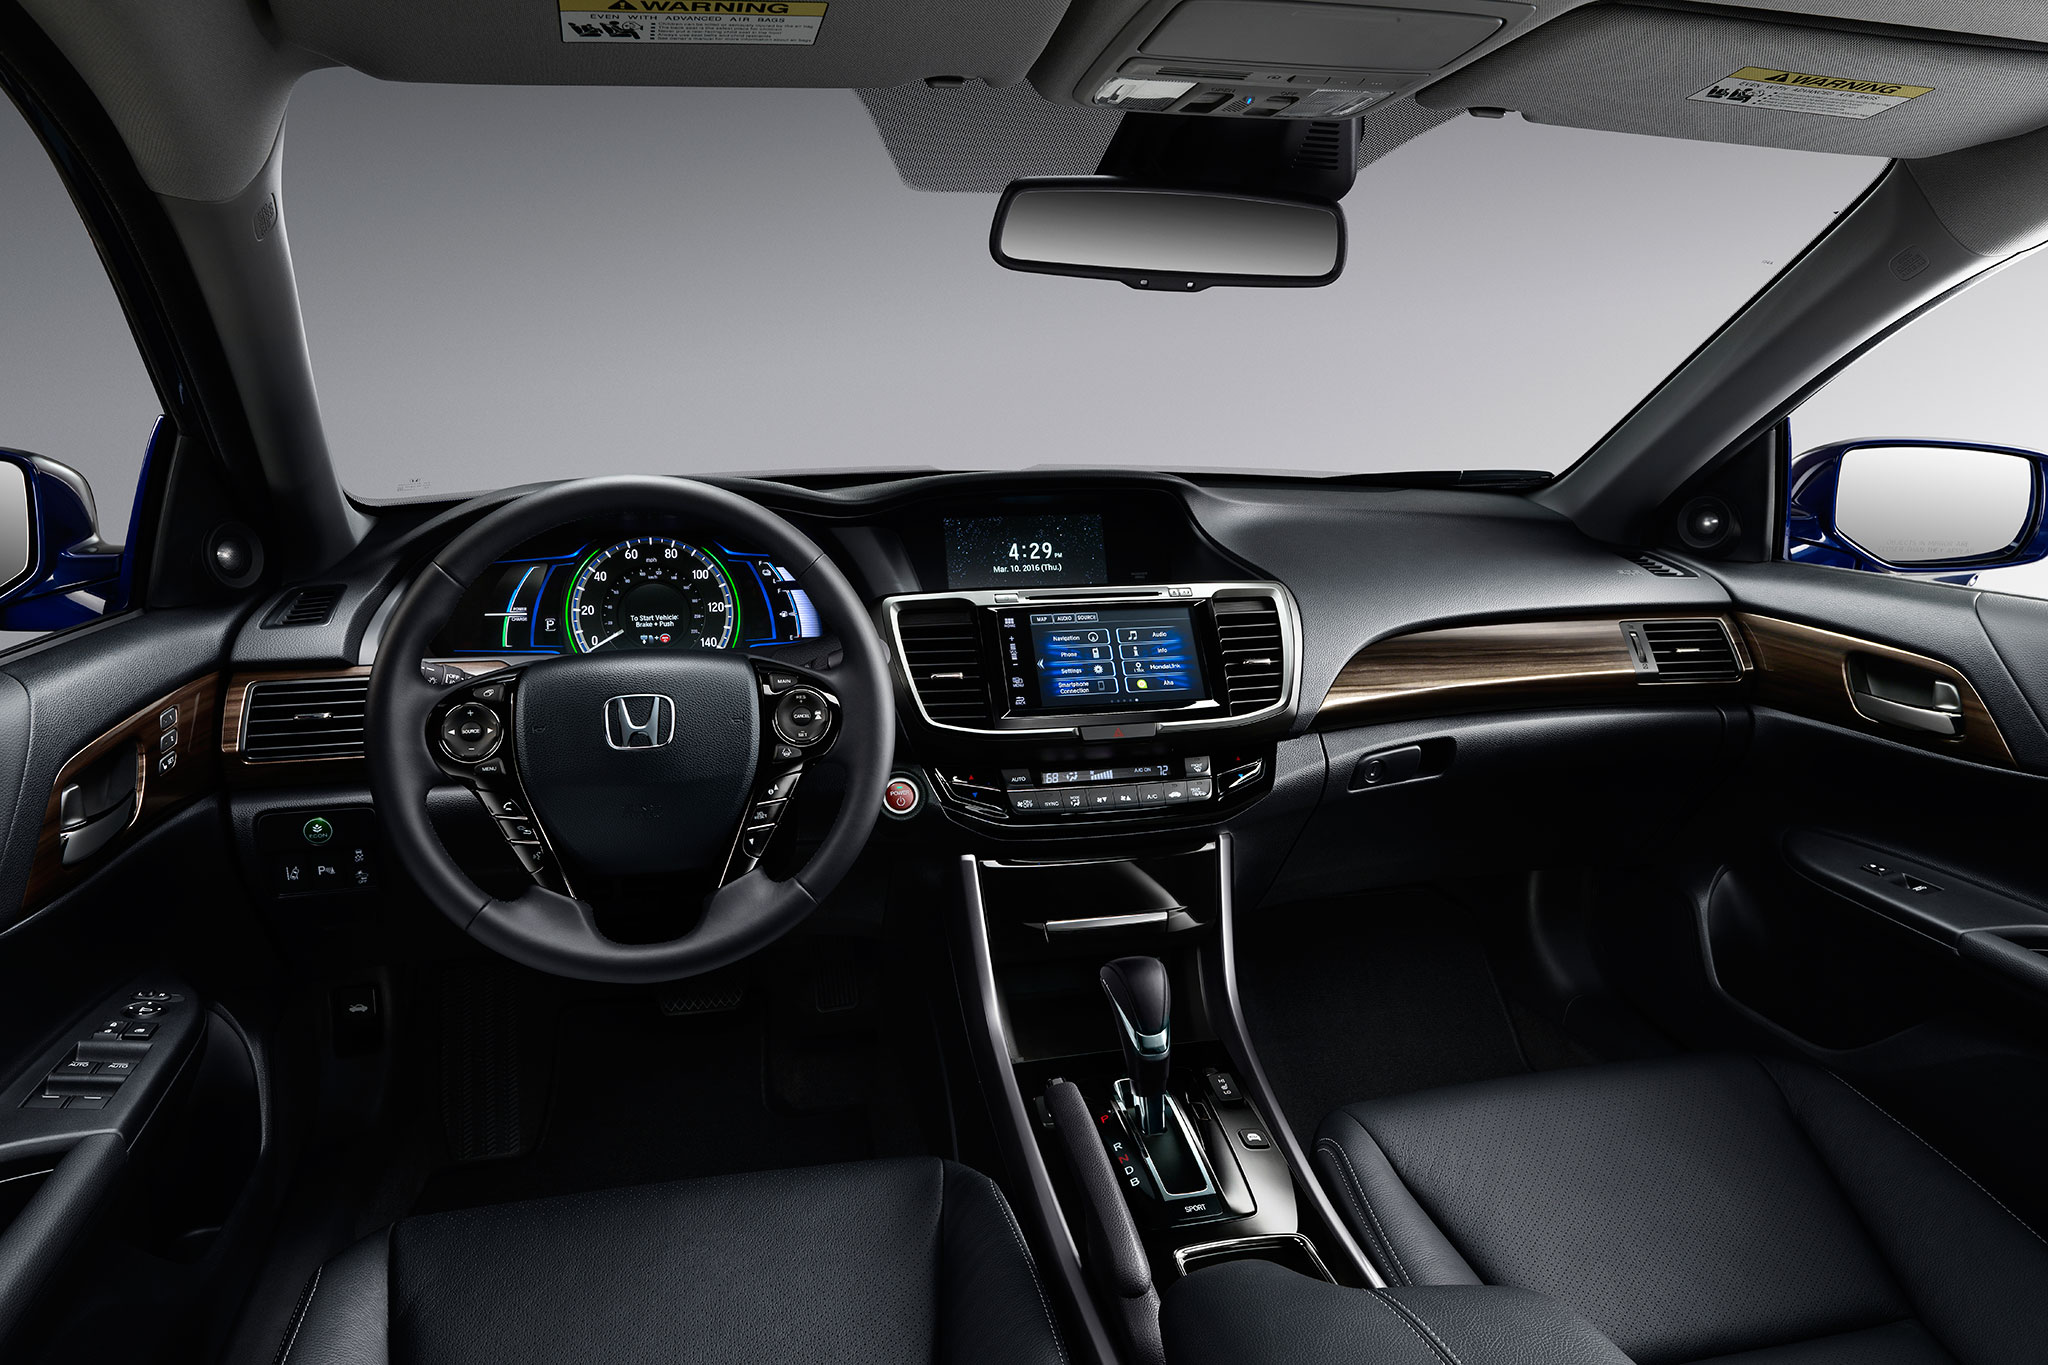 2017 Honda Accord Hybrid Cabin